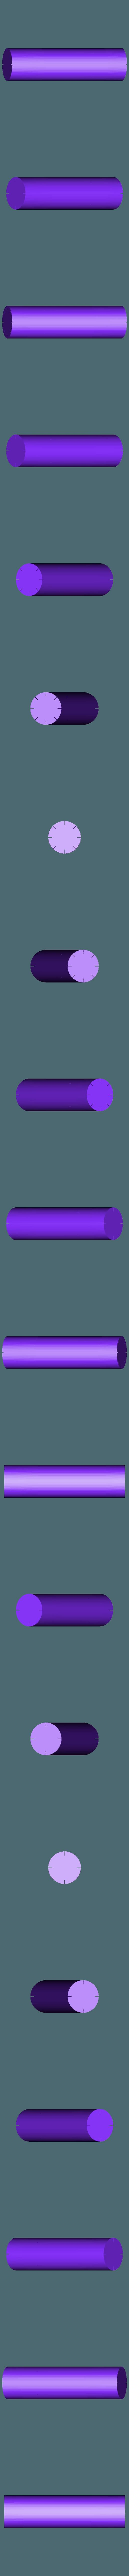 Main_Body_Rear.stl Download free STL file Flyer Mk. 1 • 3D printing object, billbo1958